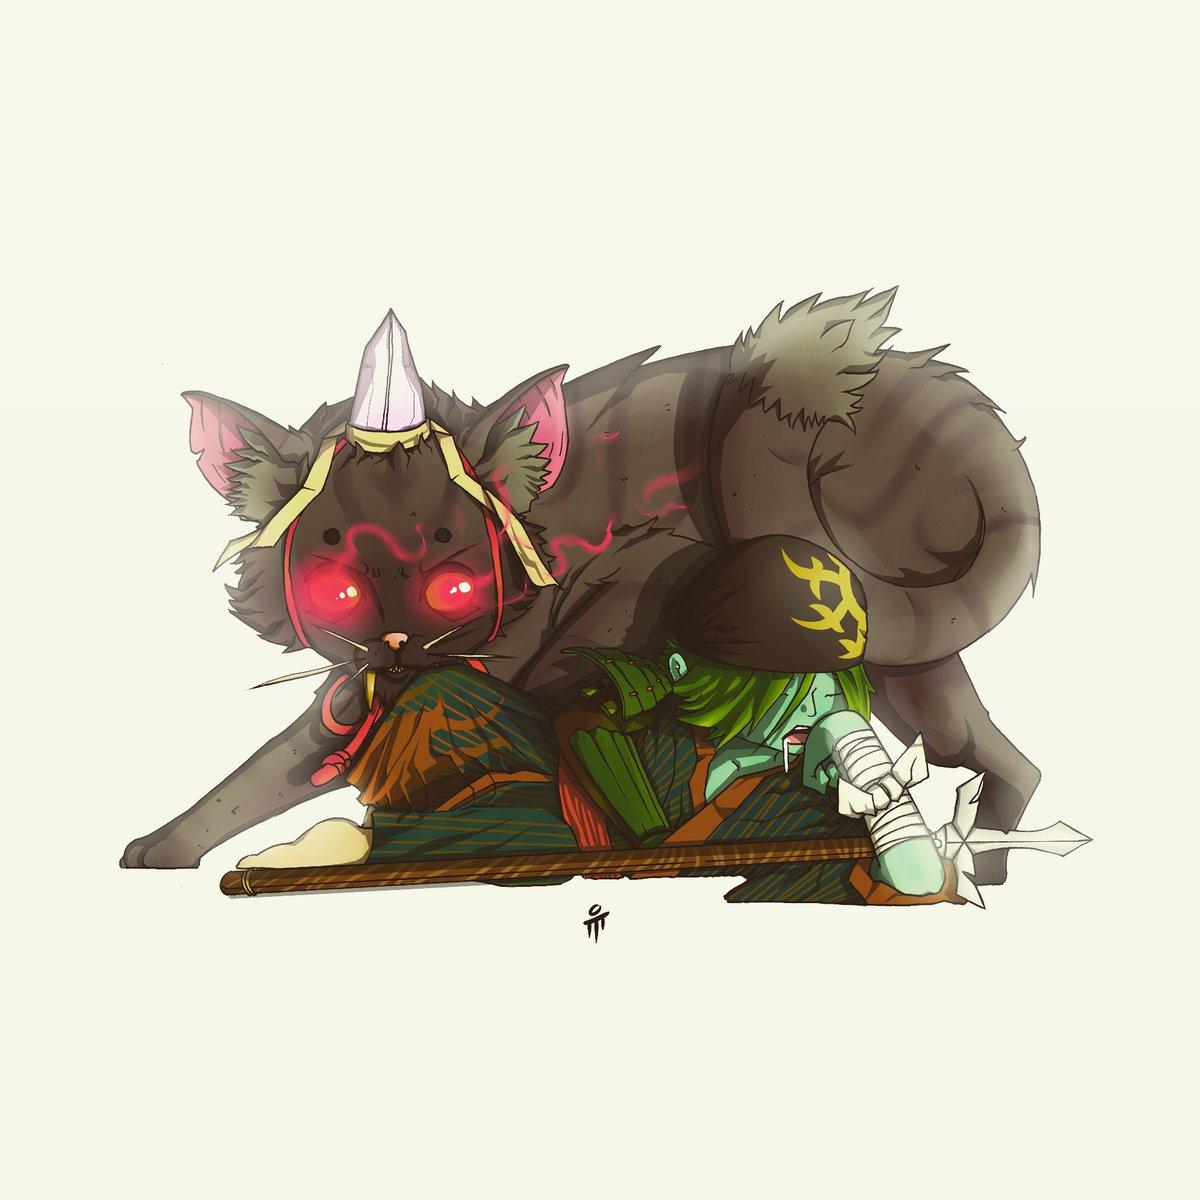 5 : People calls him Nabeshima Bakeneko or Vampire Cat Of Nabeshima!   #mumur1  #artwork  #manga #anime  #penandink  #digitalpainting #digitalcoloring #illustration  #characterdesign #indonesia  #PaintoolSai #pendrawing pic.twitter.com/qBI3mw5M8o